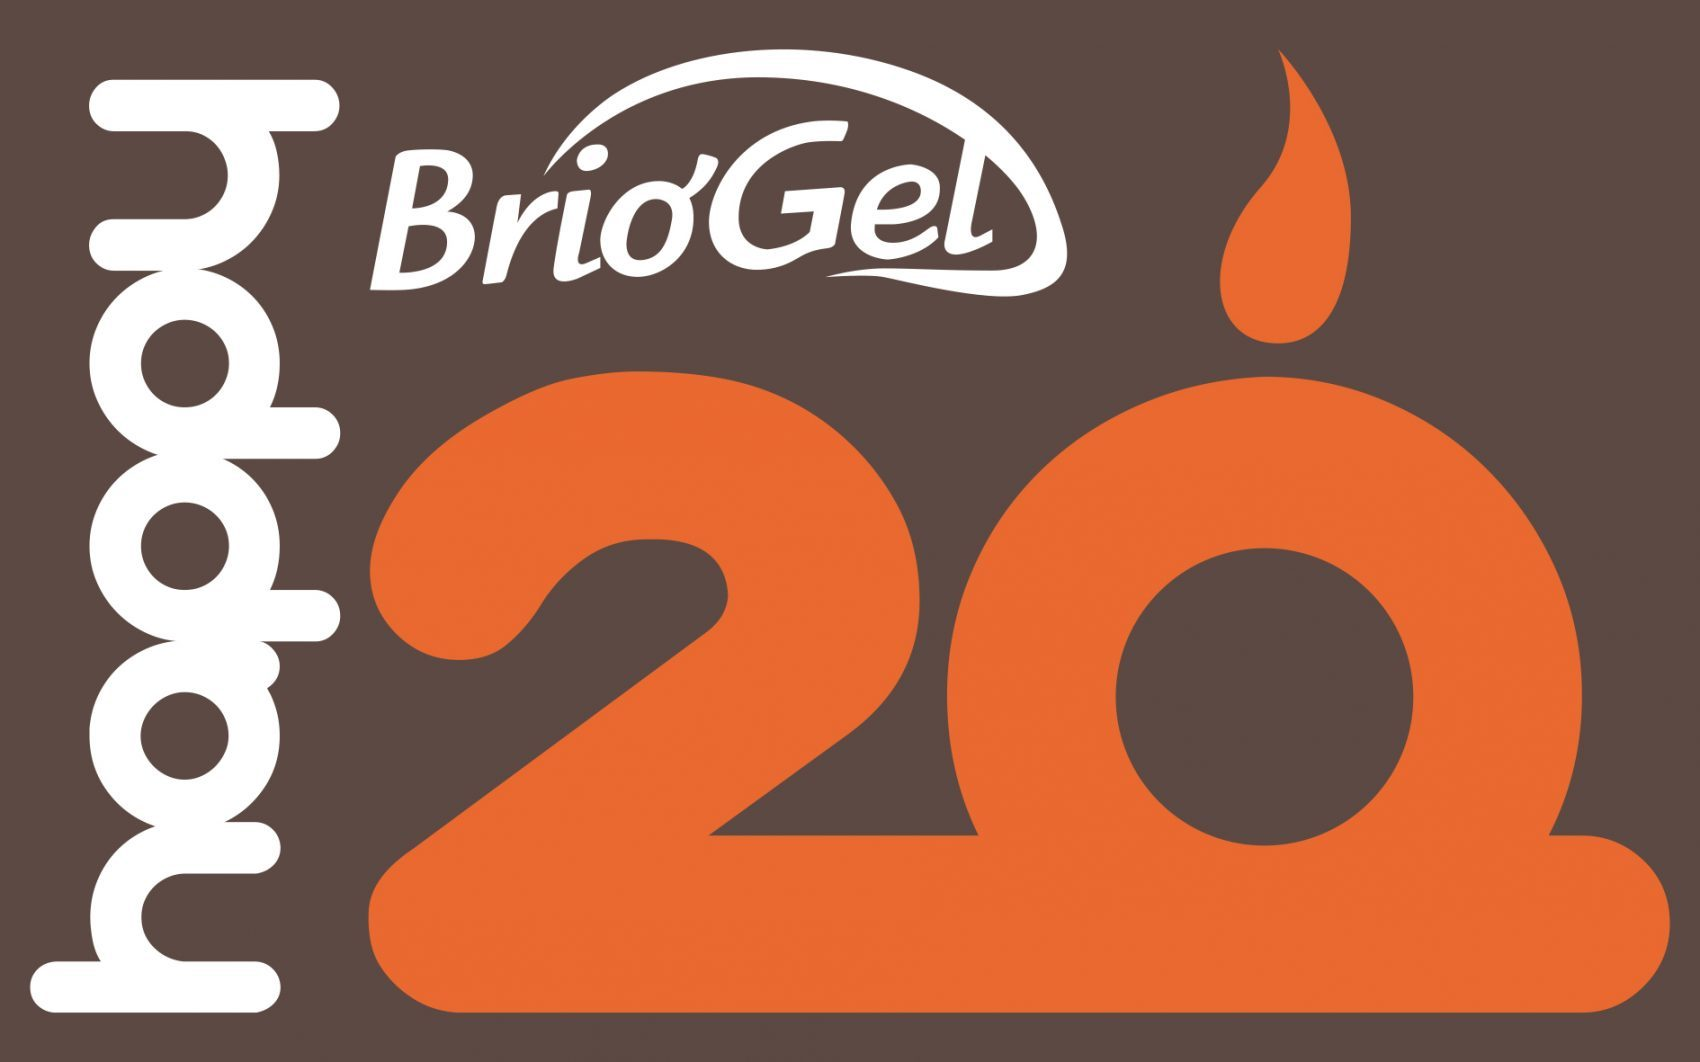 20 ans-Logo 1-Briogel